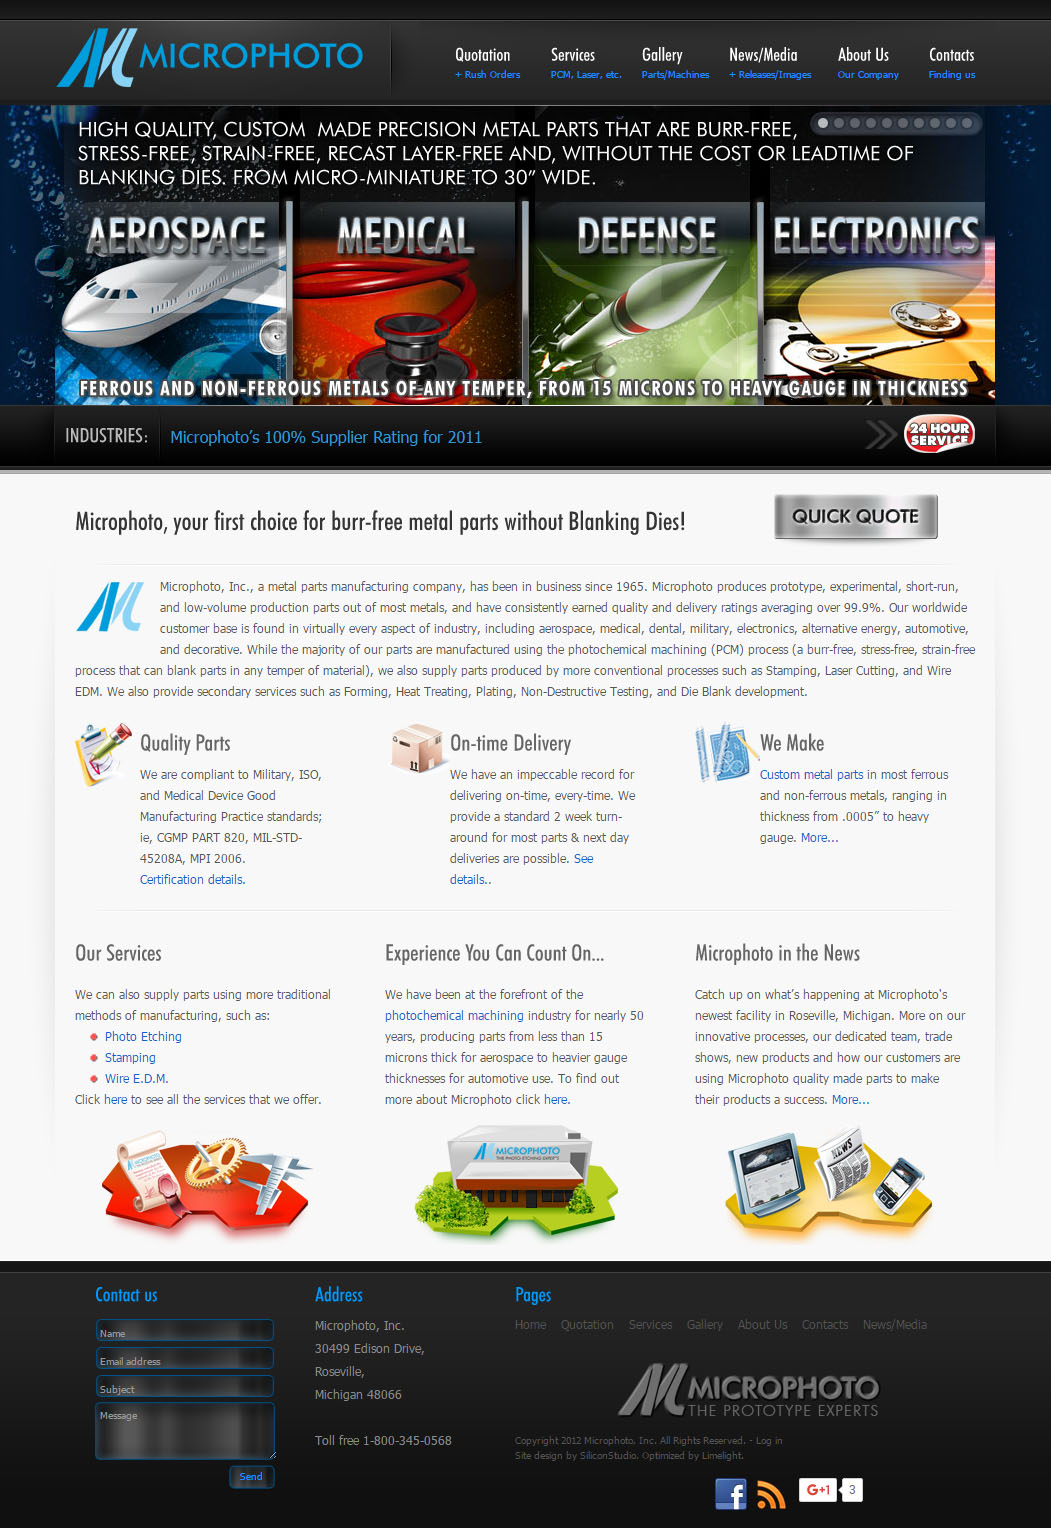 Microphoto website design slideshow